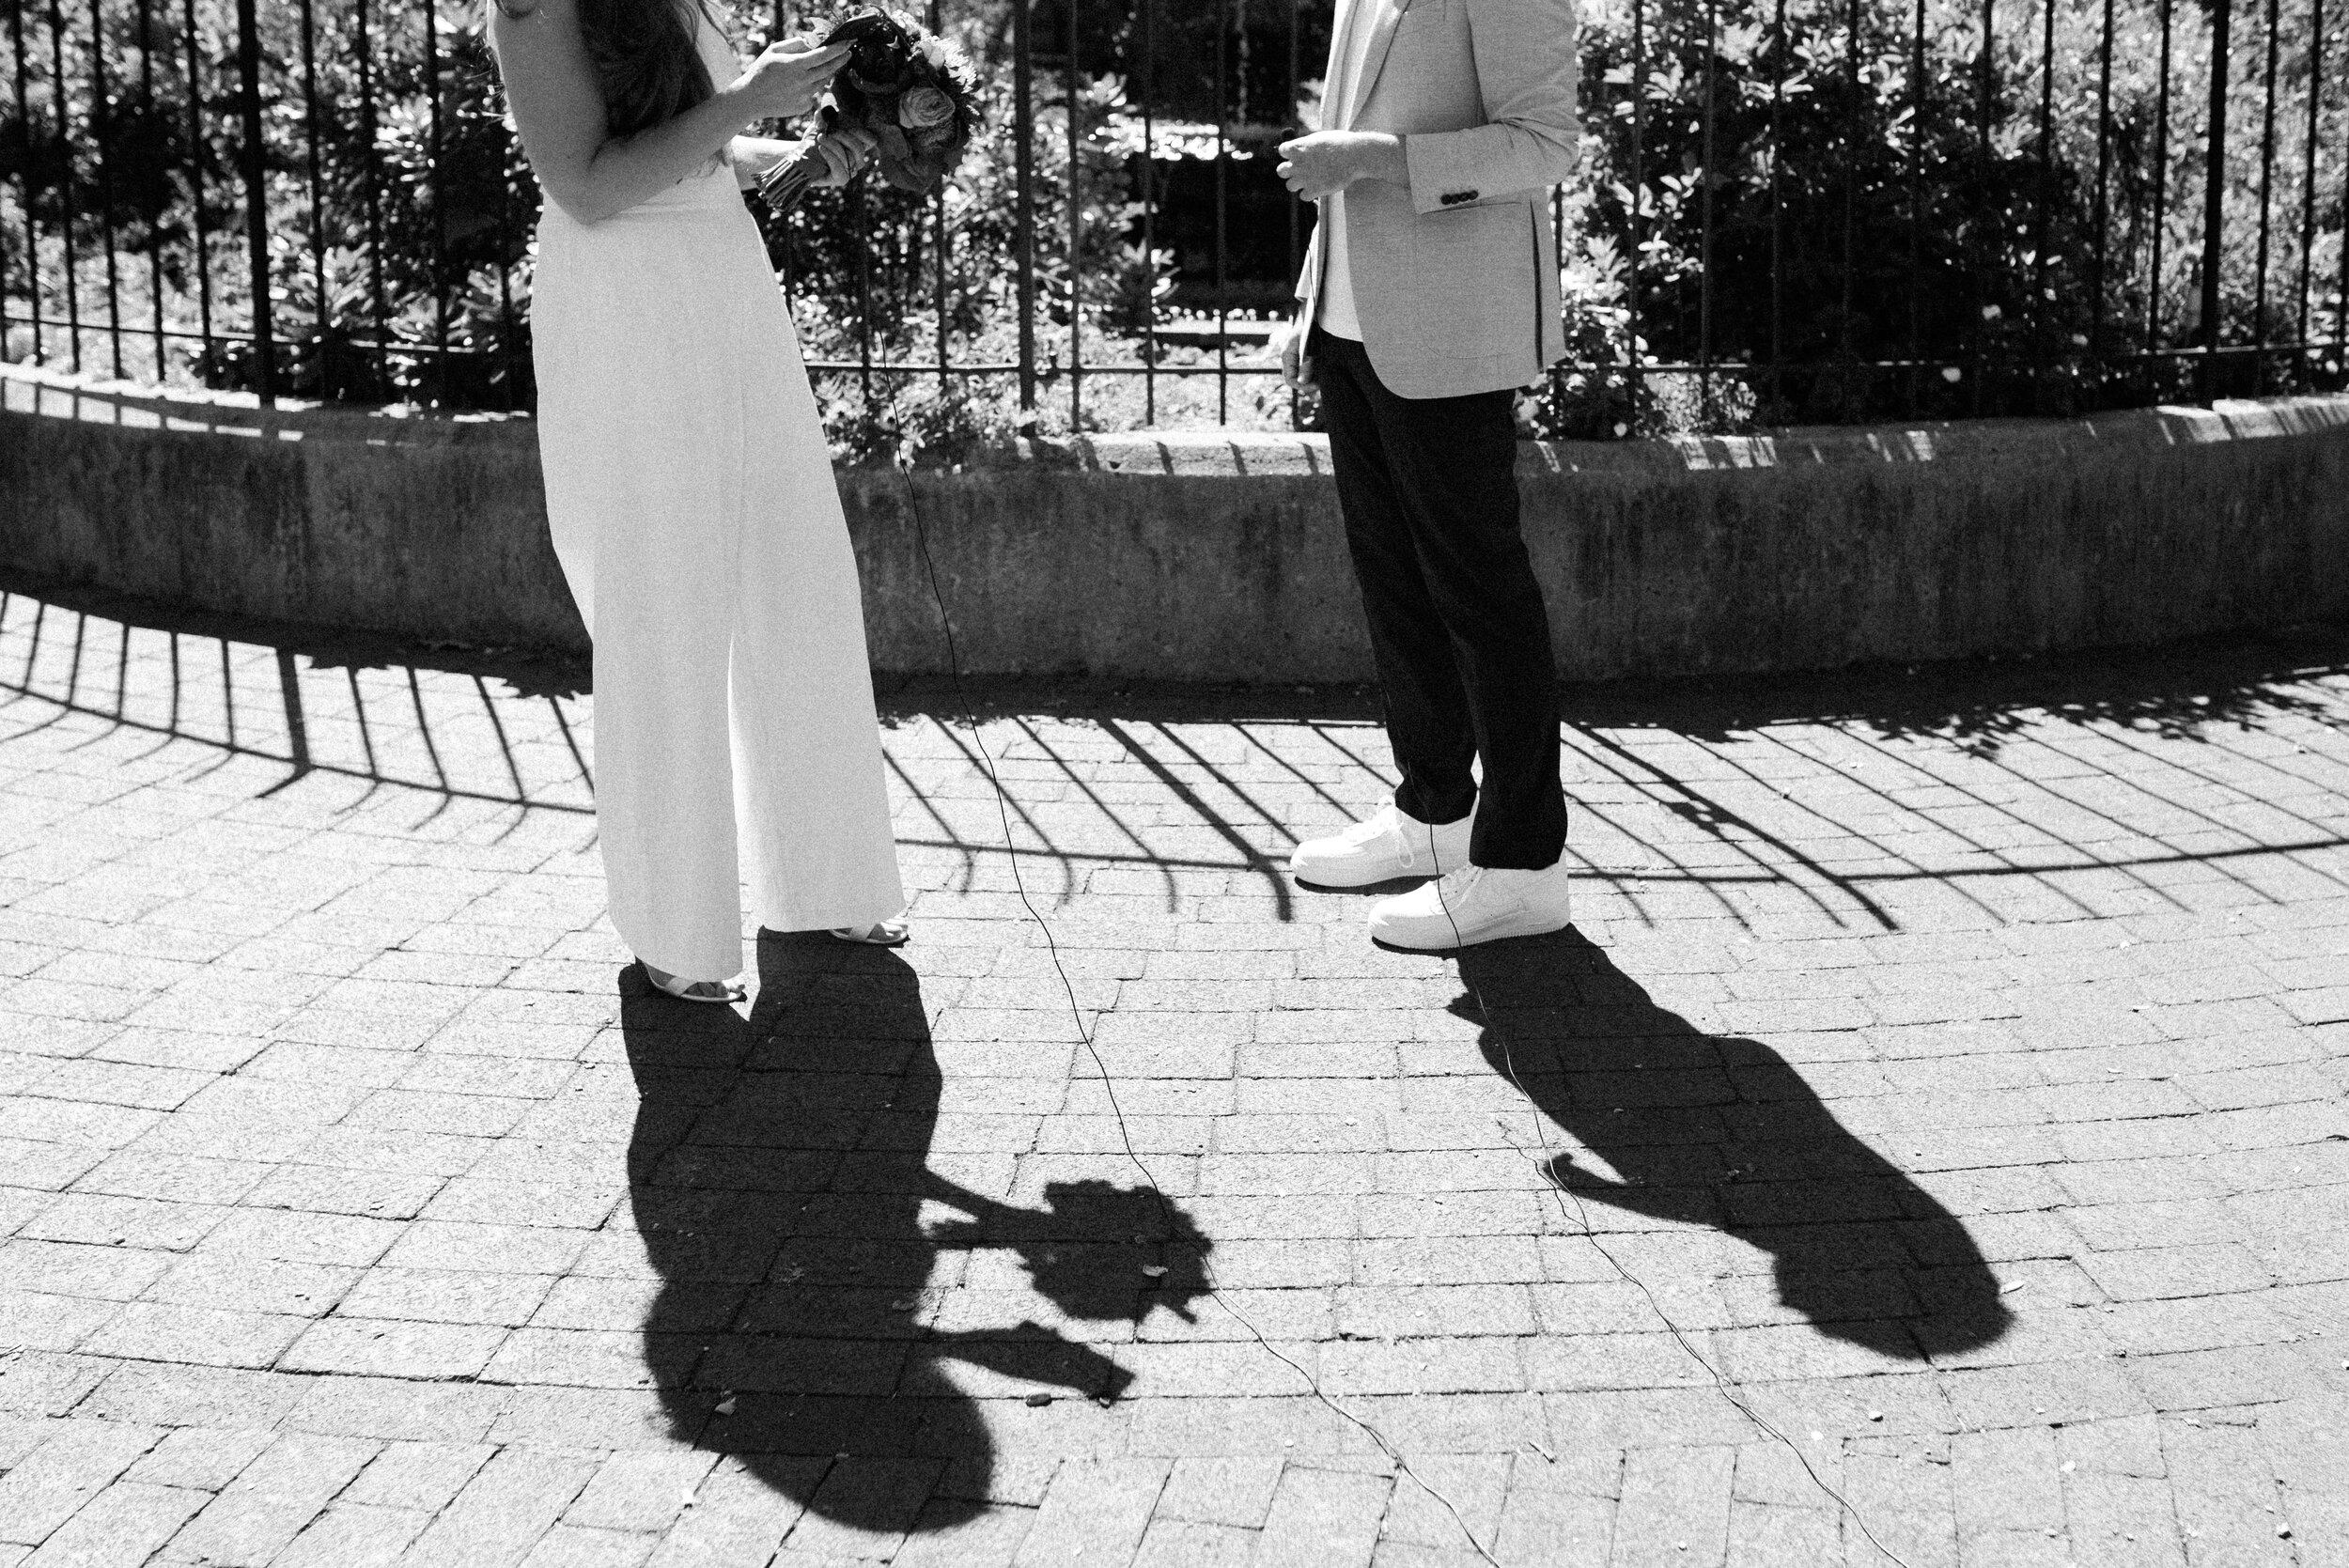 How to plan your outdoor elopement.